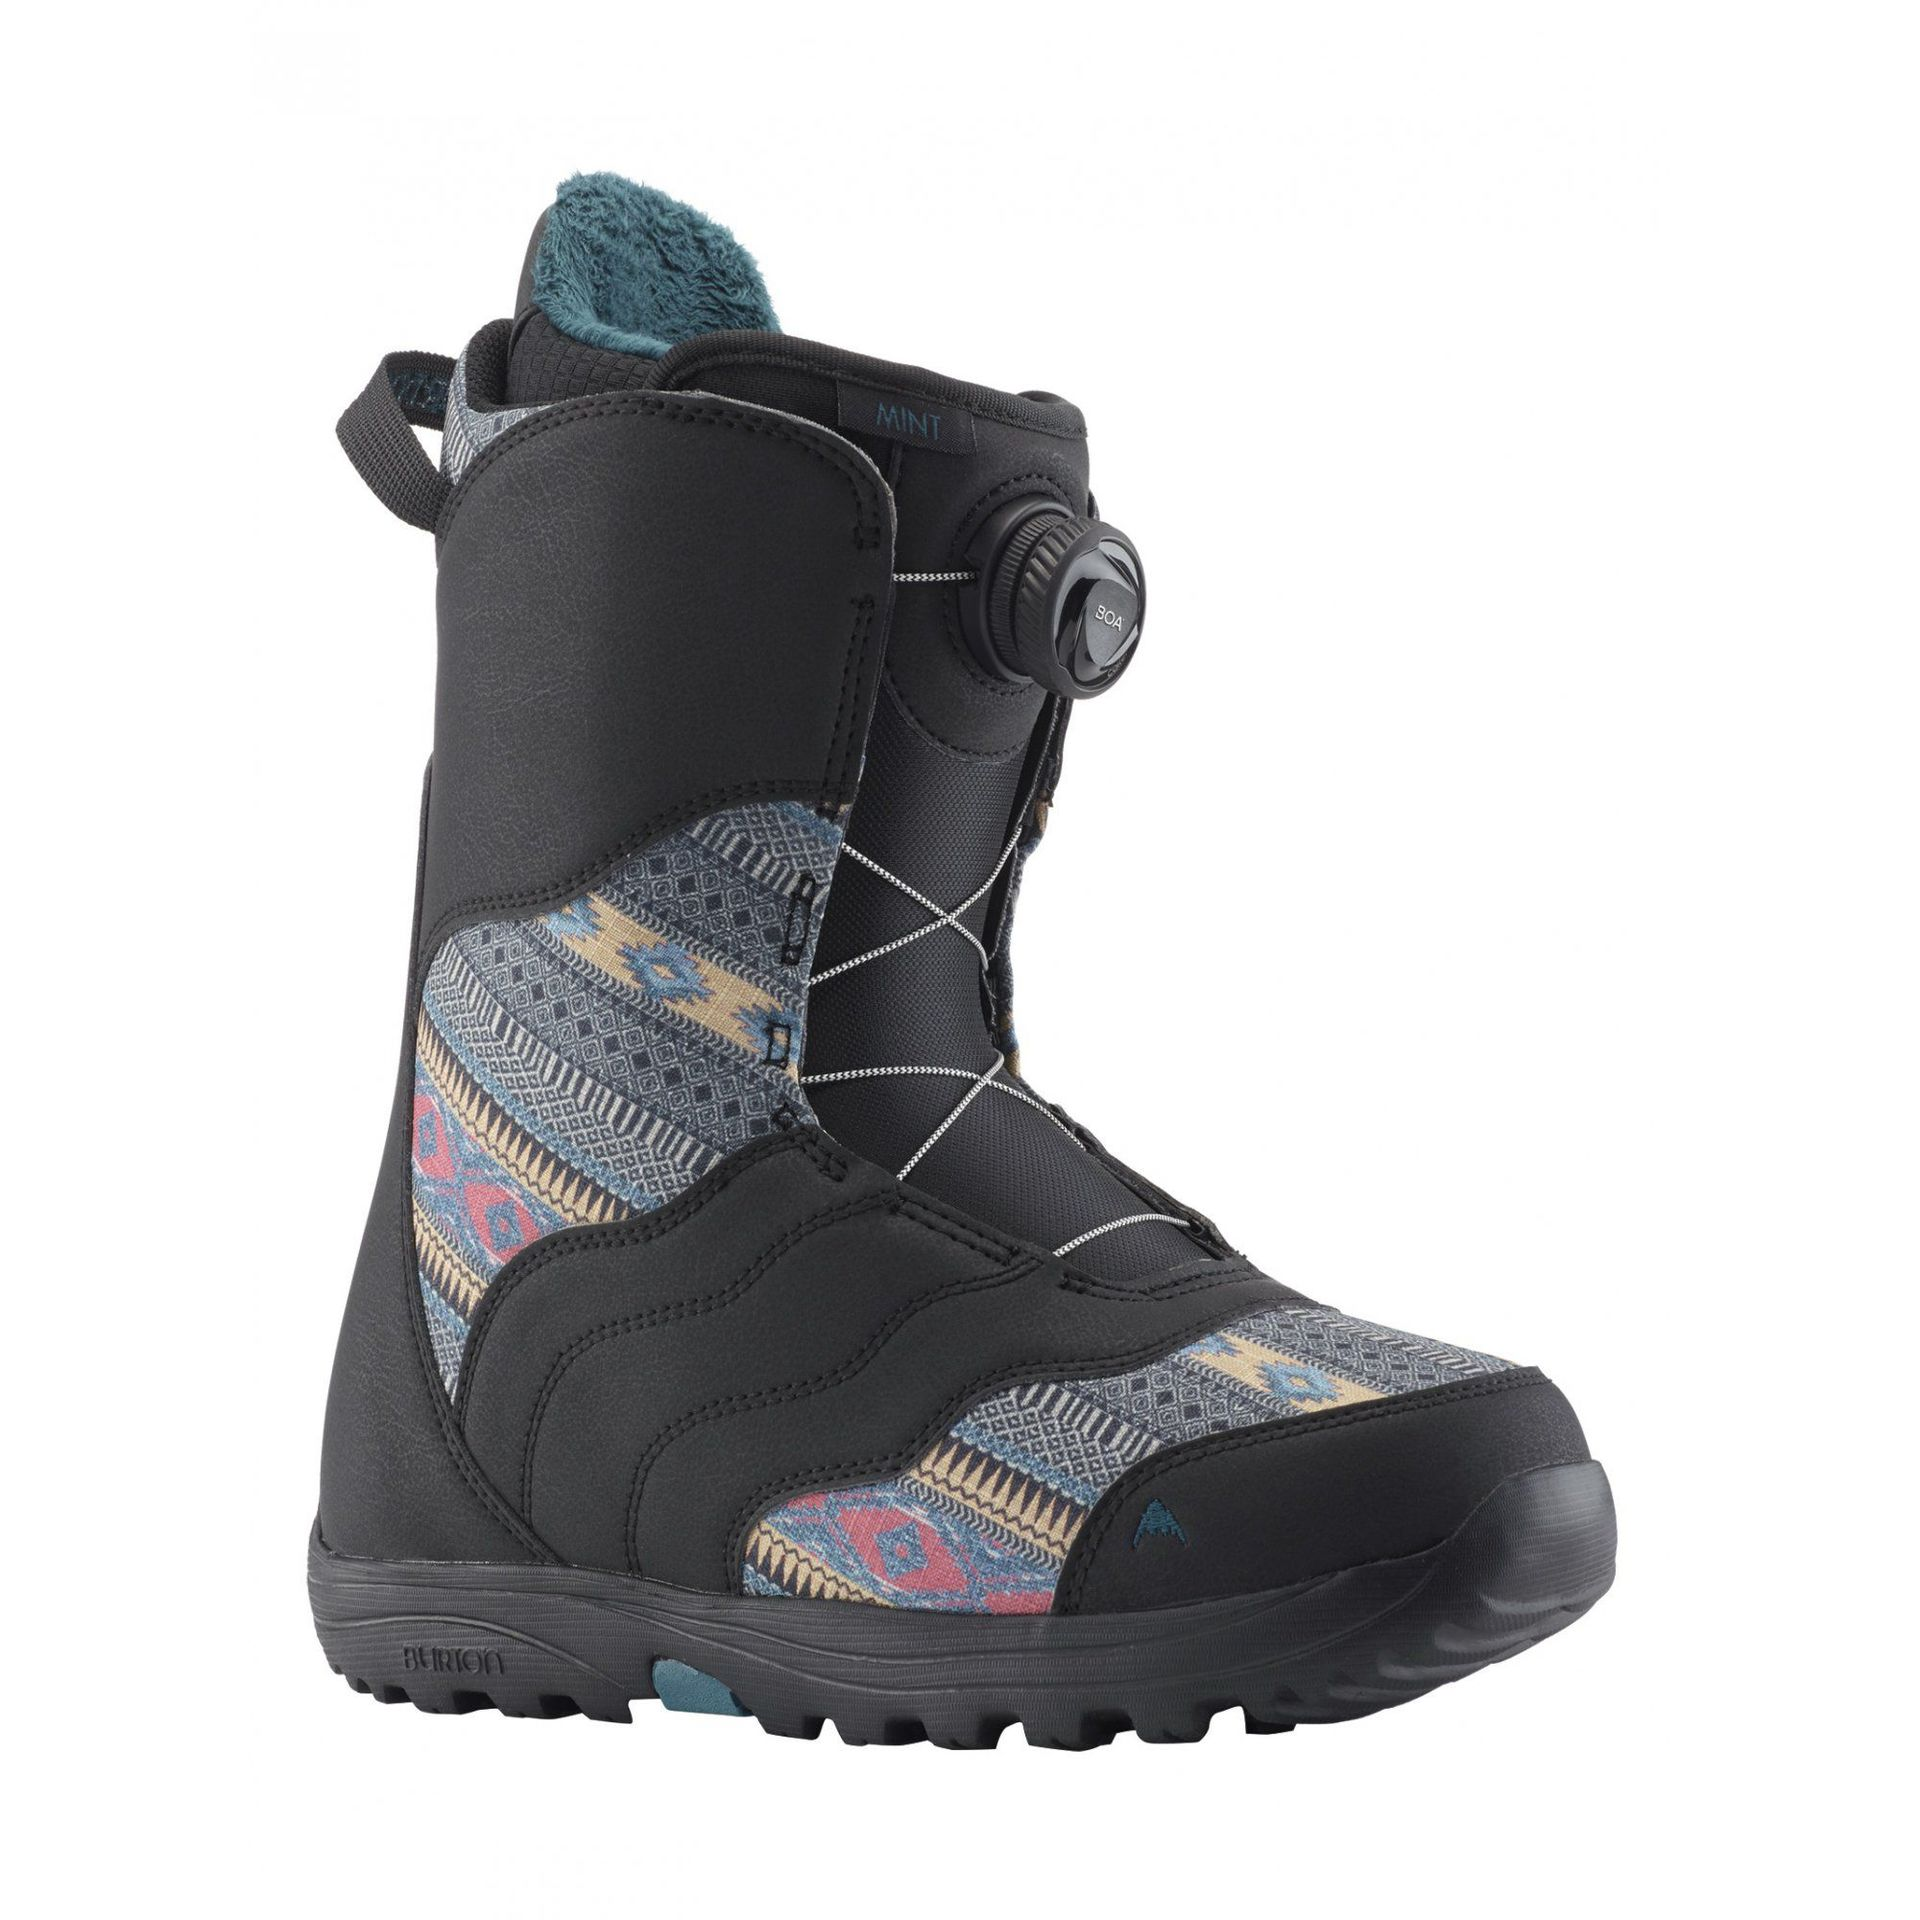 BUTY SNOWBOARDOWE BURTON MINT BOA BLACK MULTI 131771-022 1